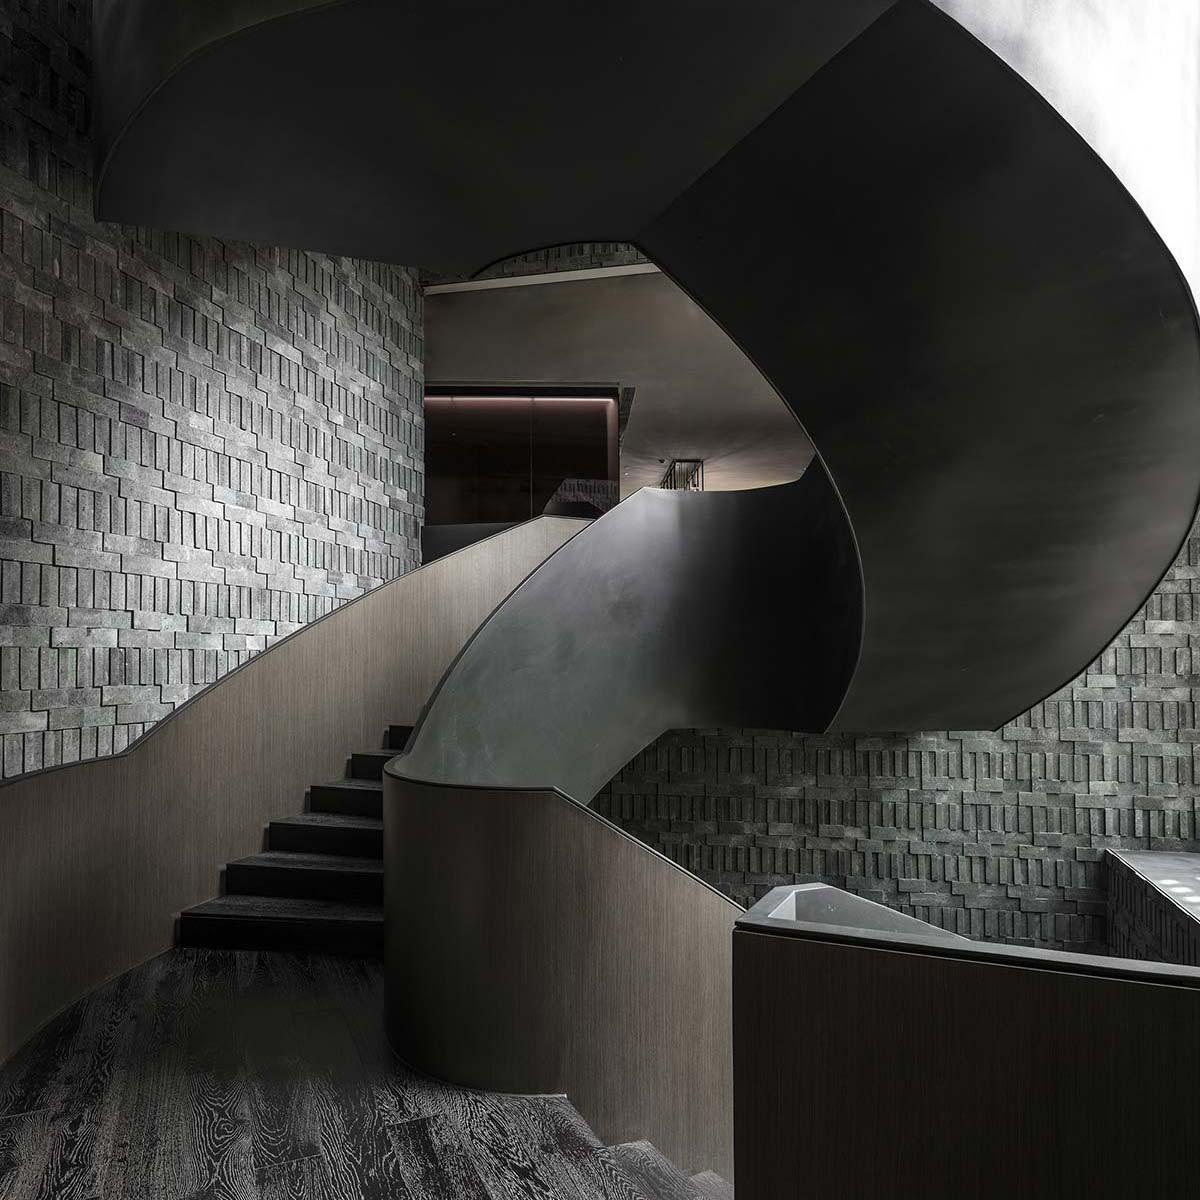 The-Middle-House-Shanghai---ResidencesThe Middle House, Shanghai - Staircase